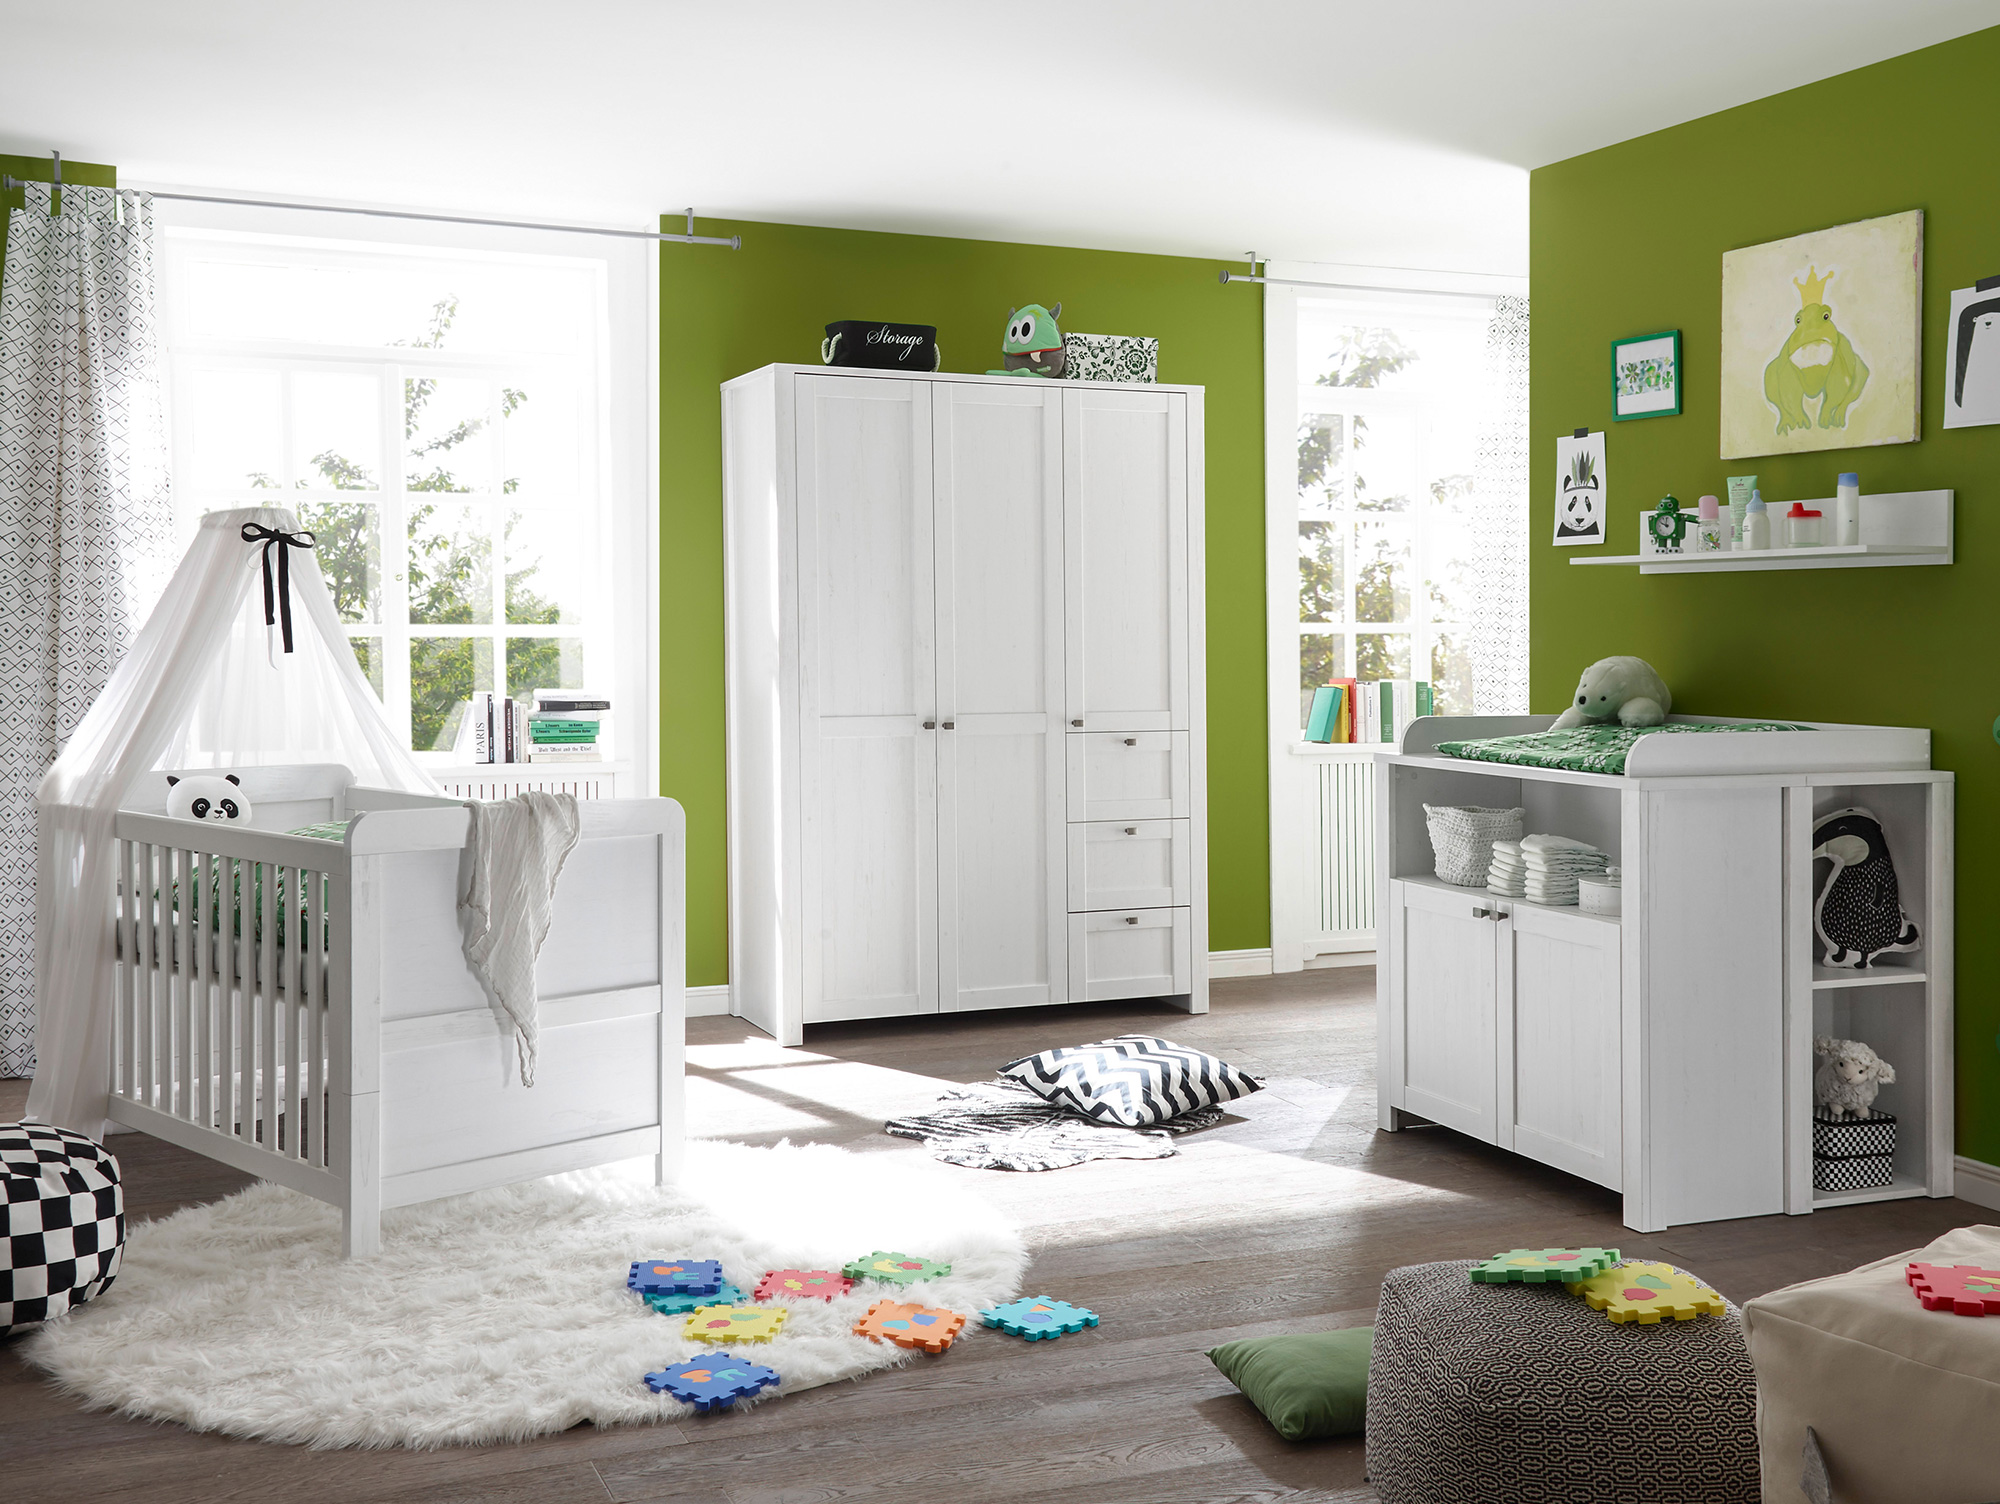 levina komplett babyzimmer material dekorspanplatte weiss piniefarbig. Black Bedroom Furniture Sets. Home Design Ideas